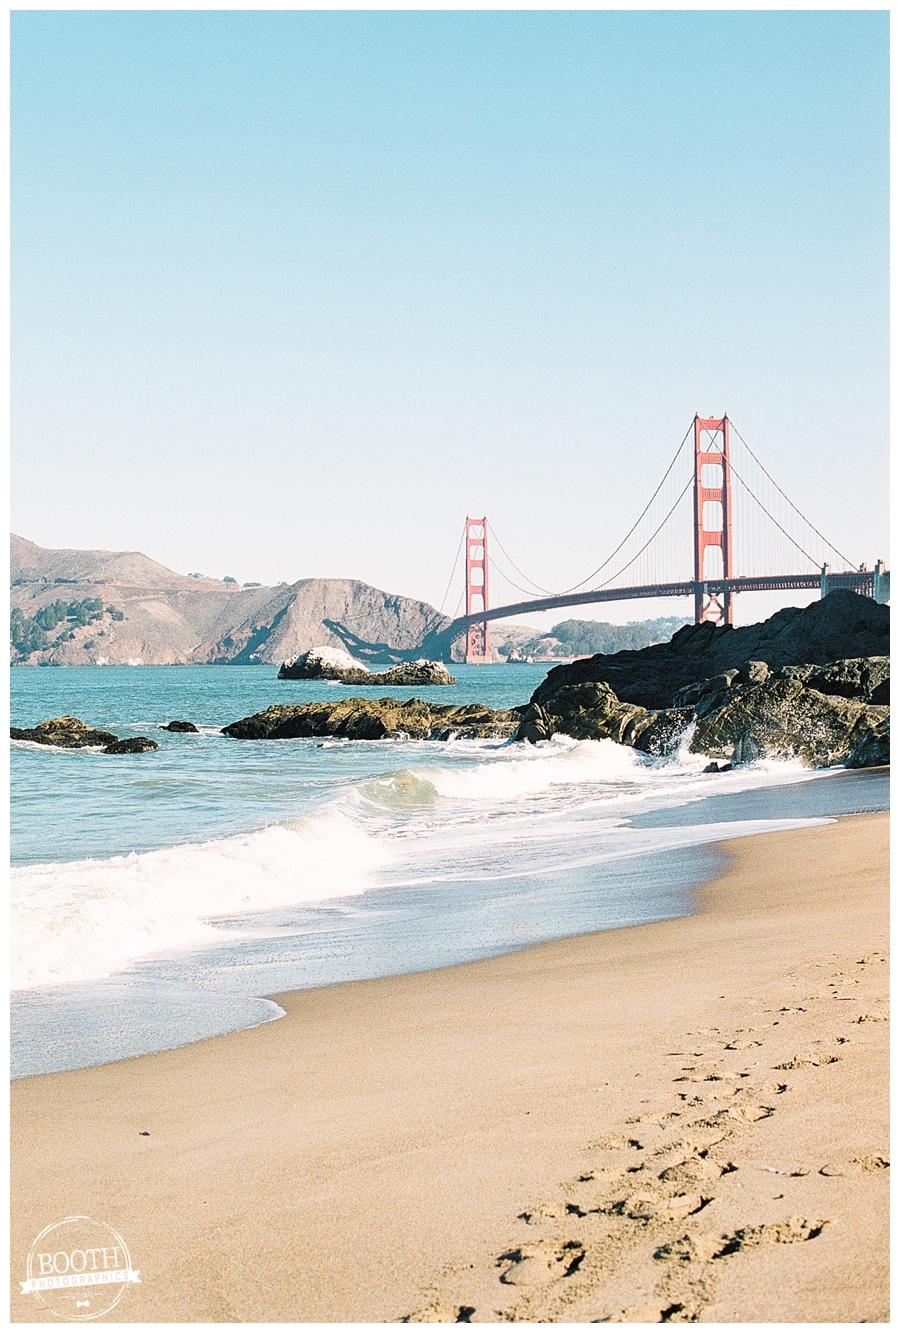 Baker Beach near the Golden Gate Bridge in San Francisco, CA